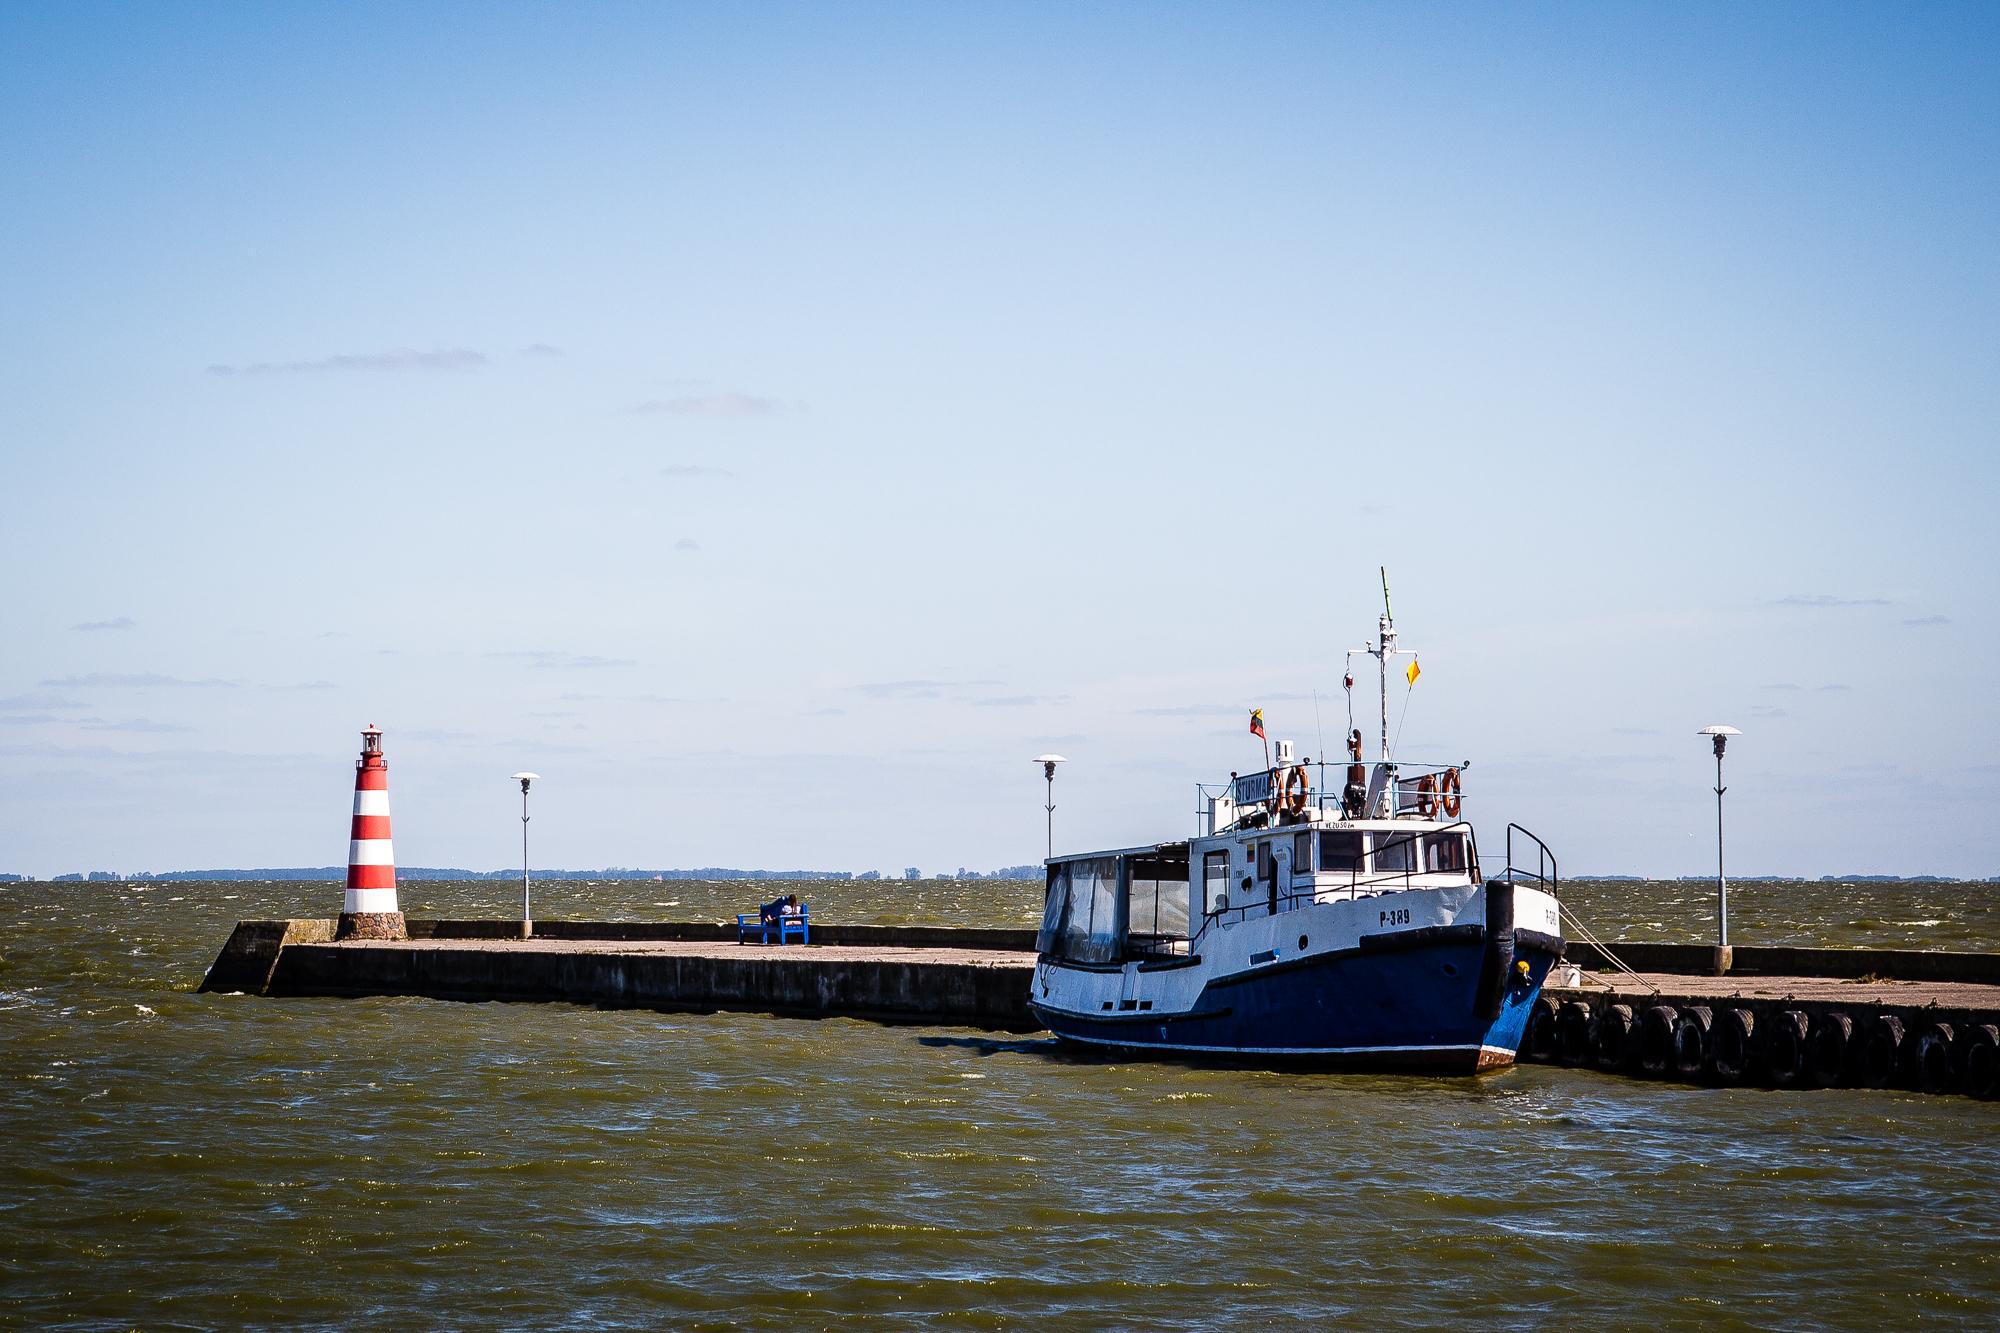 Fishing Boat Via @Atisgailis